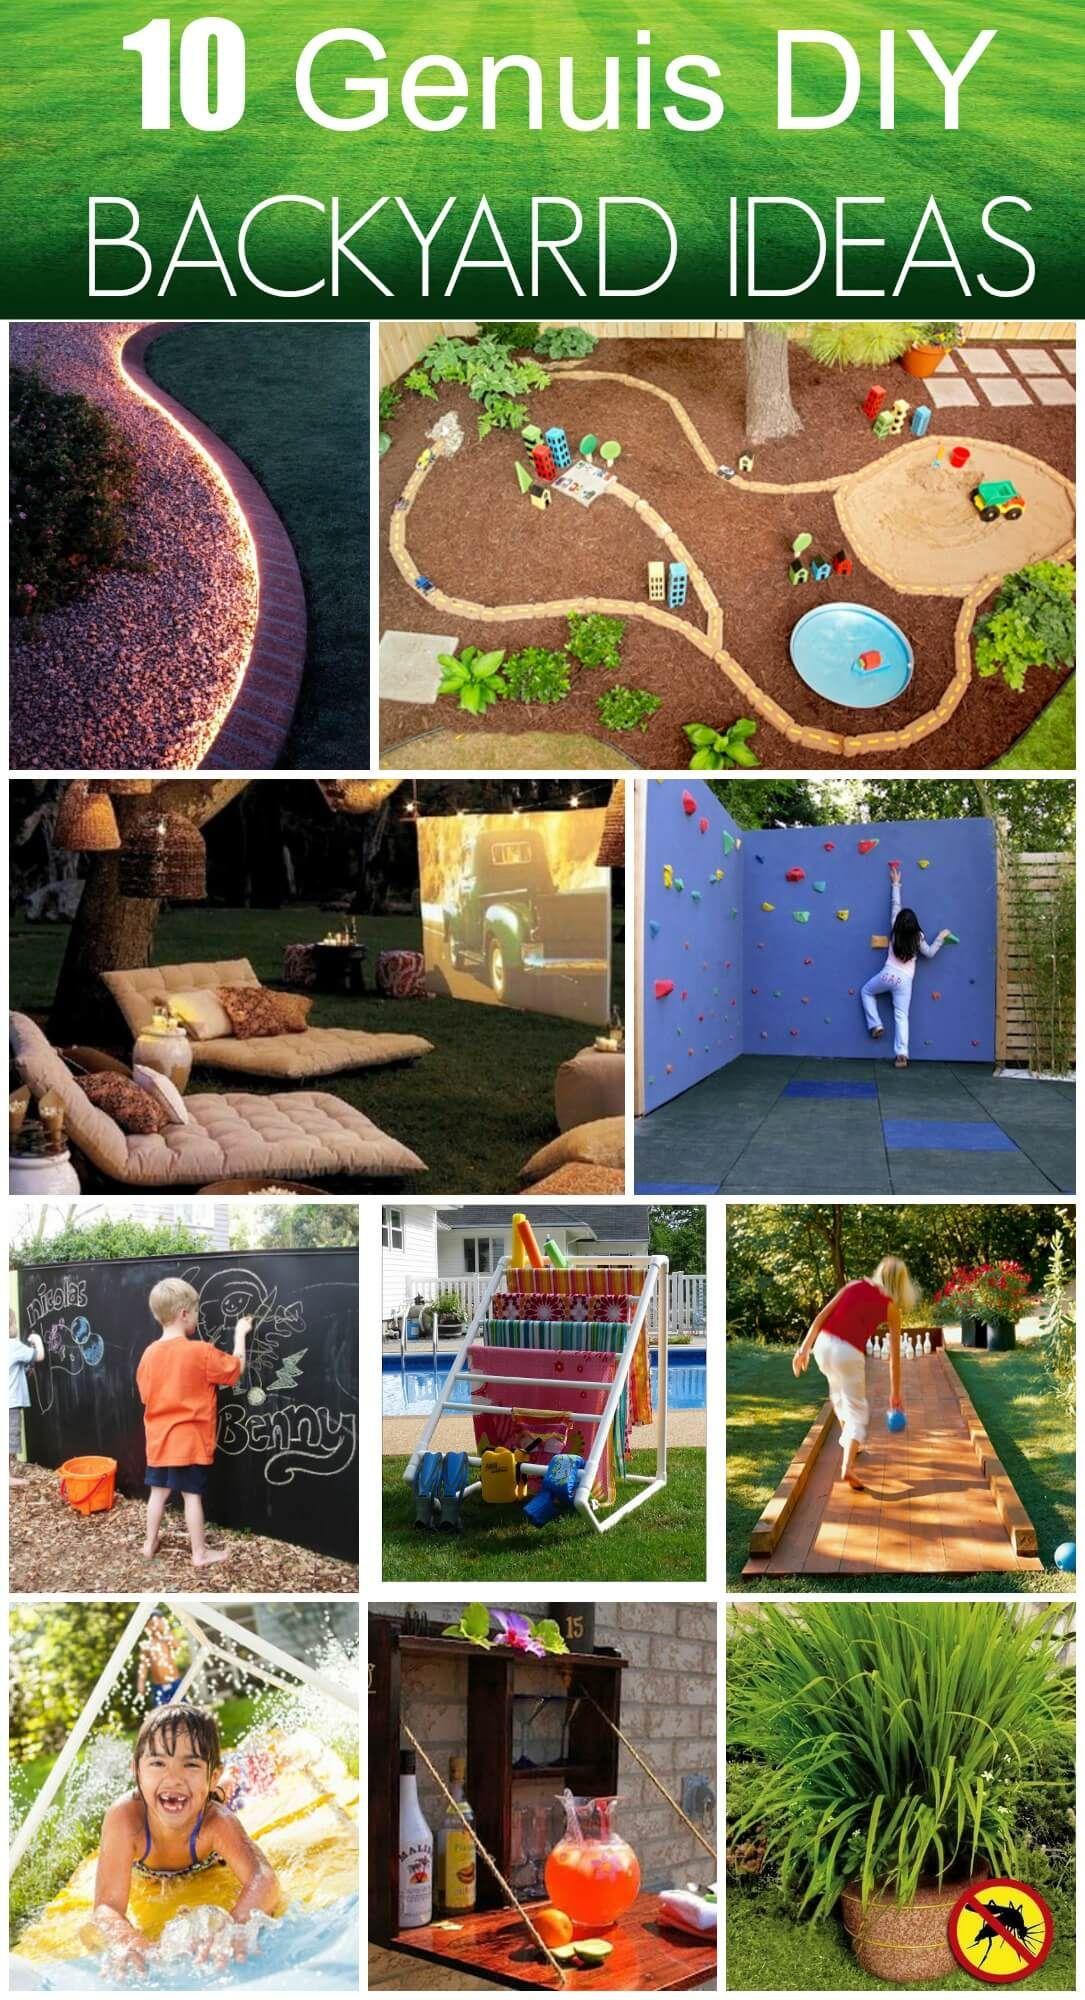 genius diy backyard ideas that will transform your yard page 2